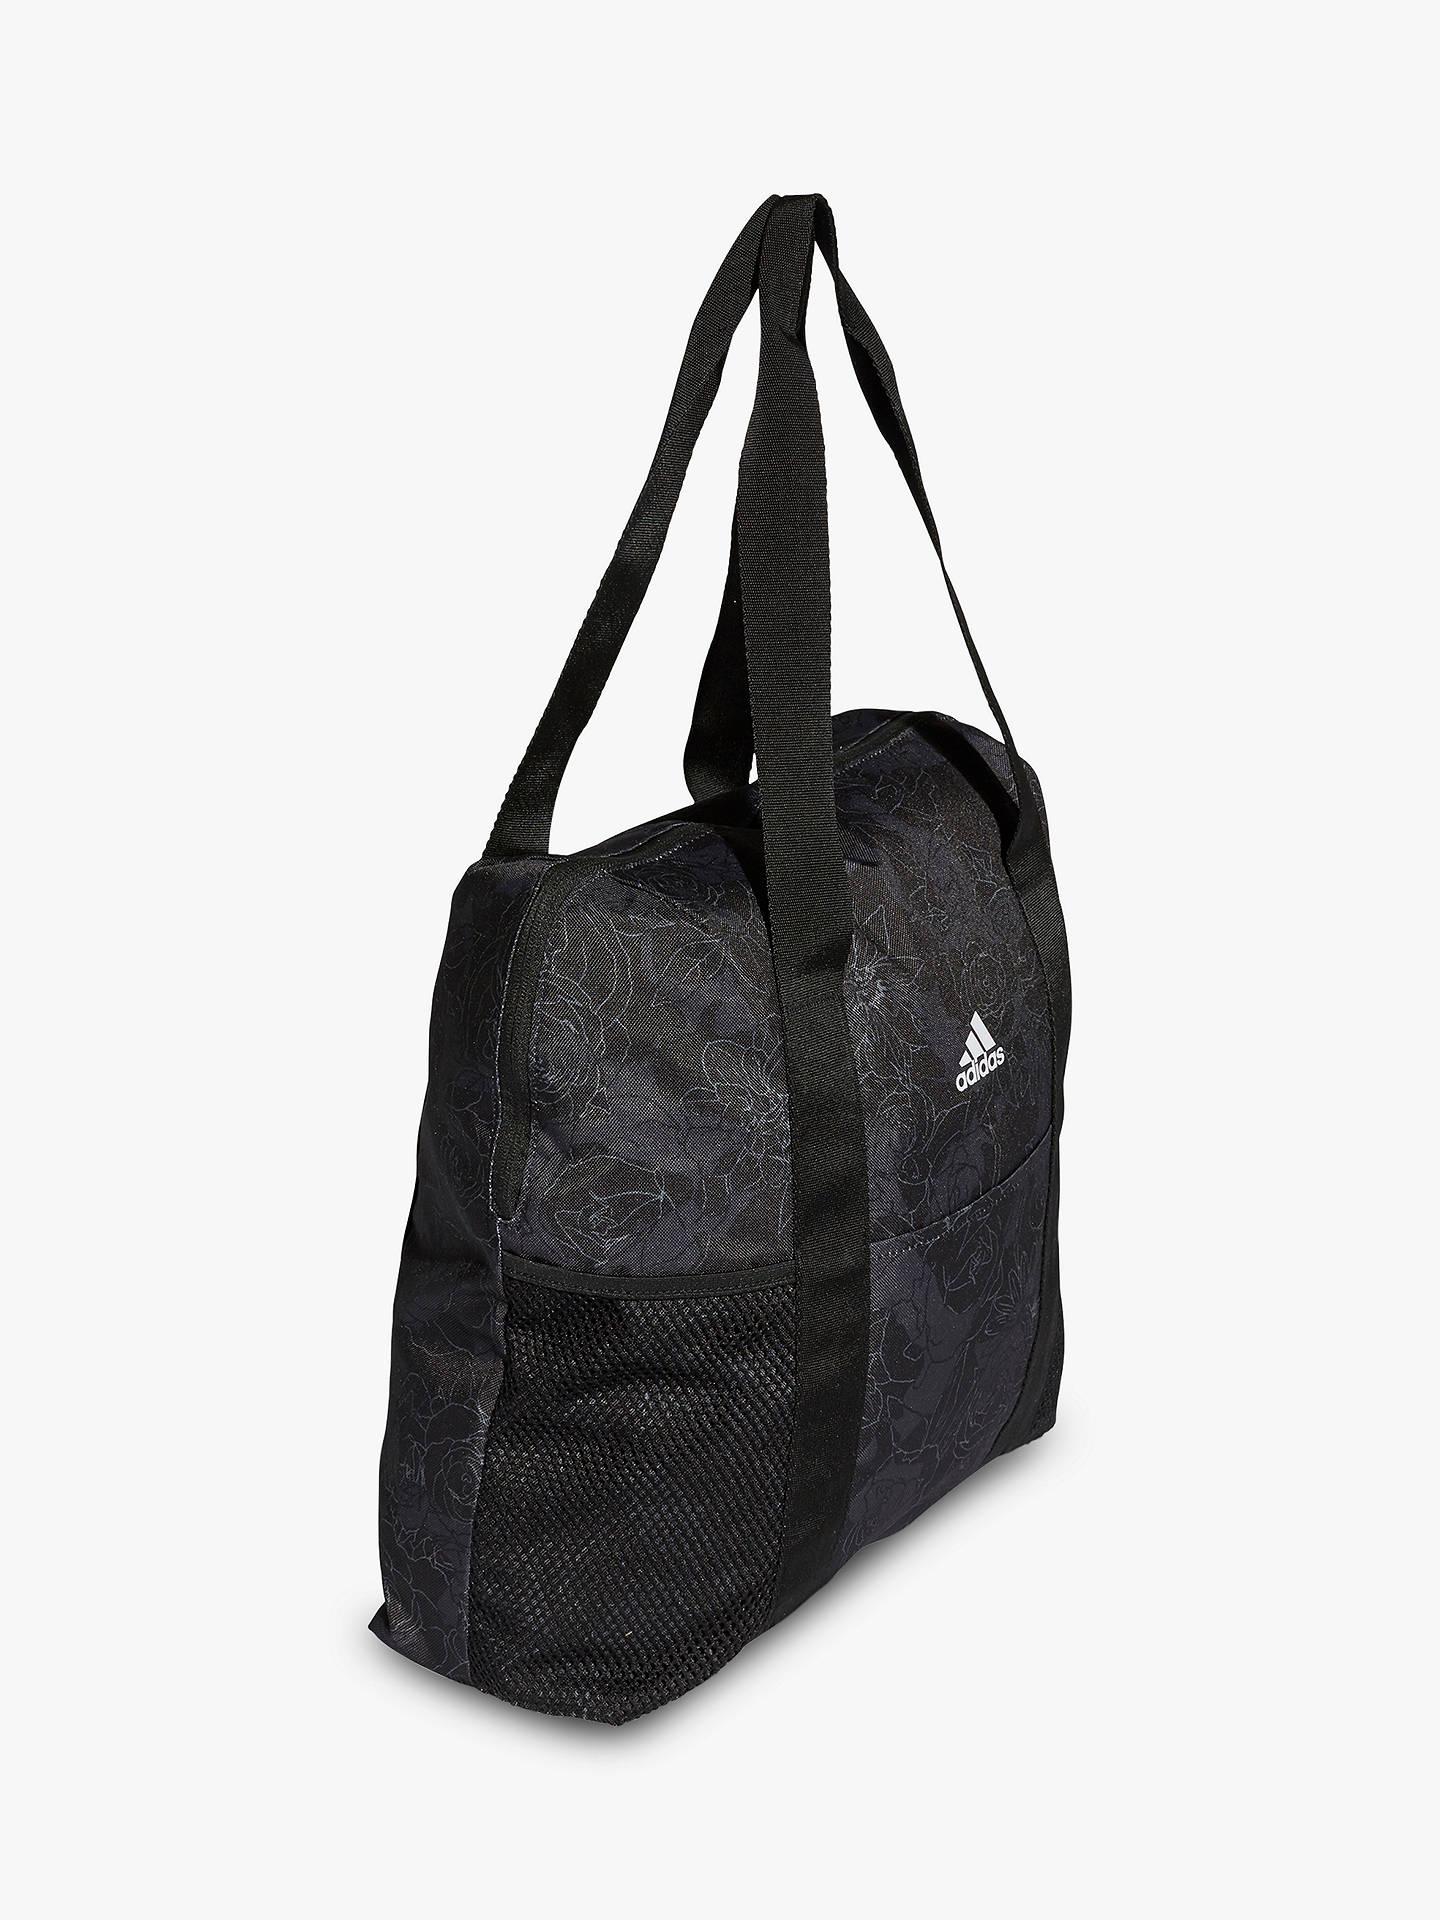 ... Buyadidas Core Training Tote Bag caaee4a16d570